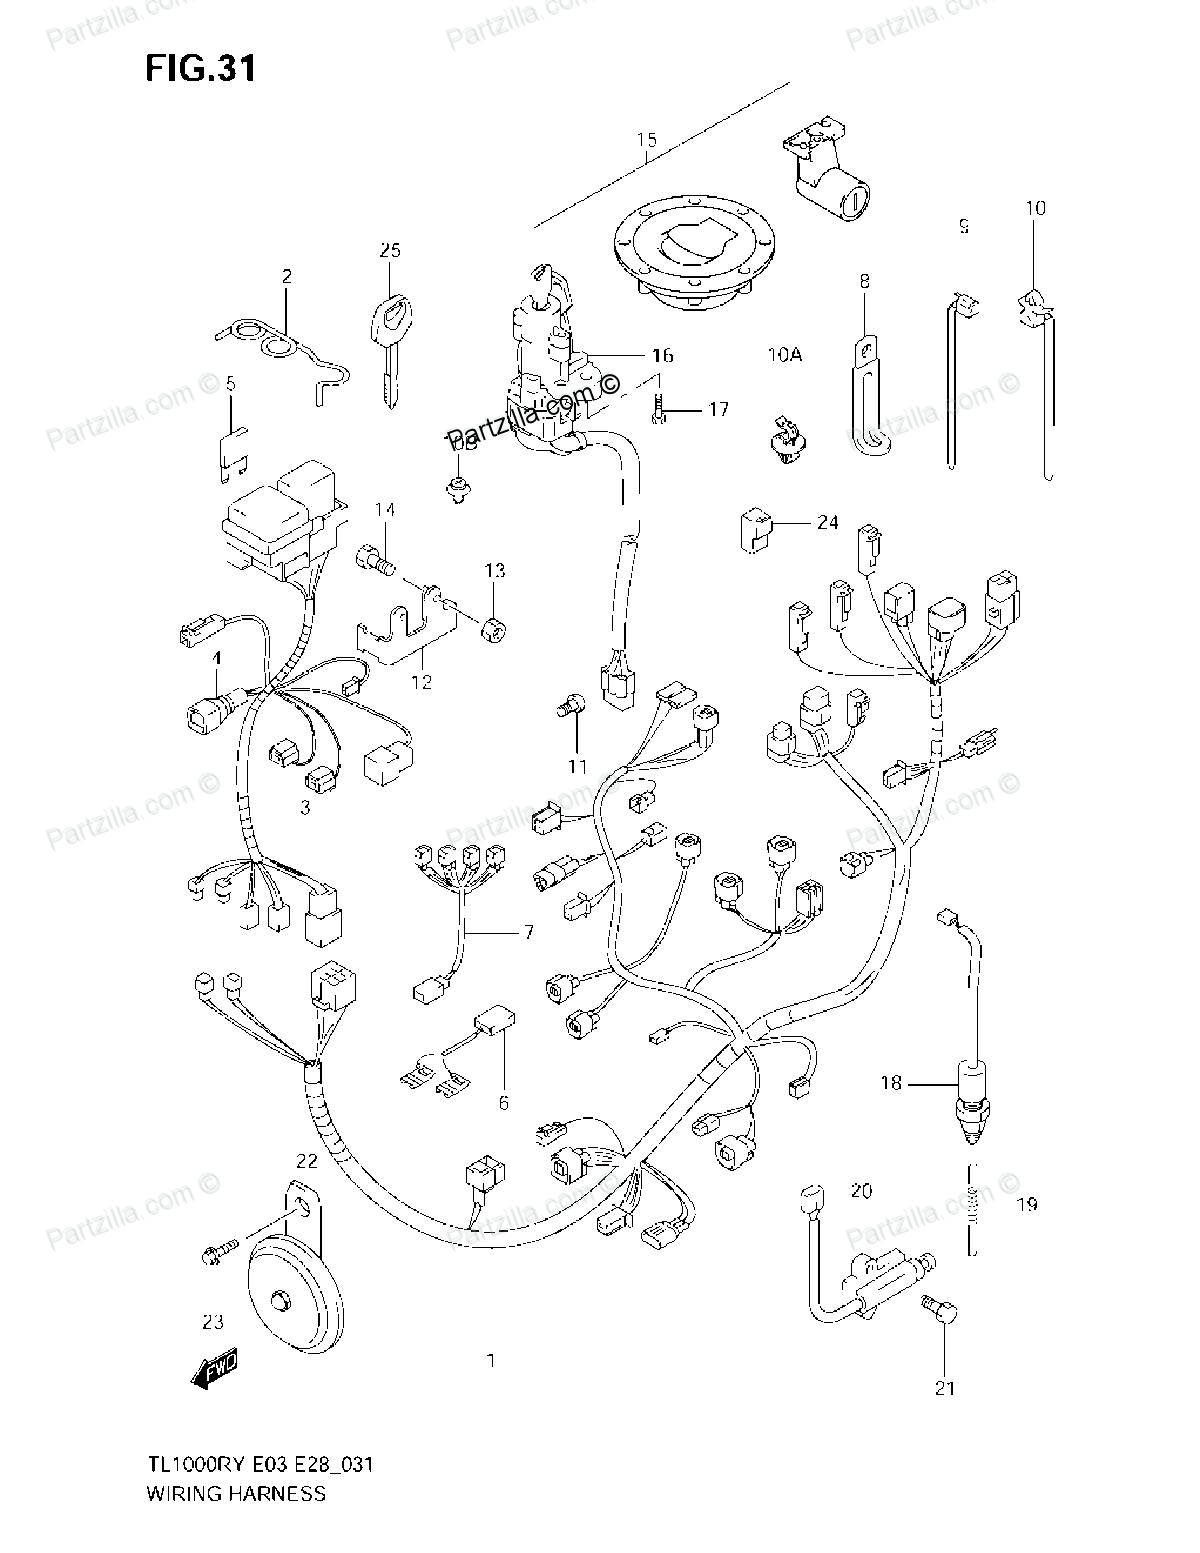 wiring diagram for 2001 suzuki tl 1000 wiring library 2013 VW Wiring Diagram wiring diagram suzuki tl1000s